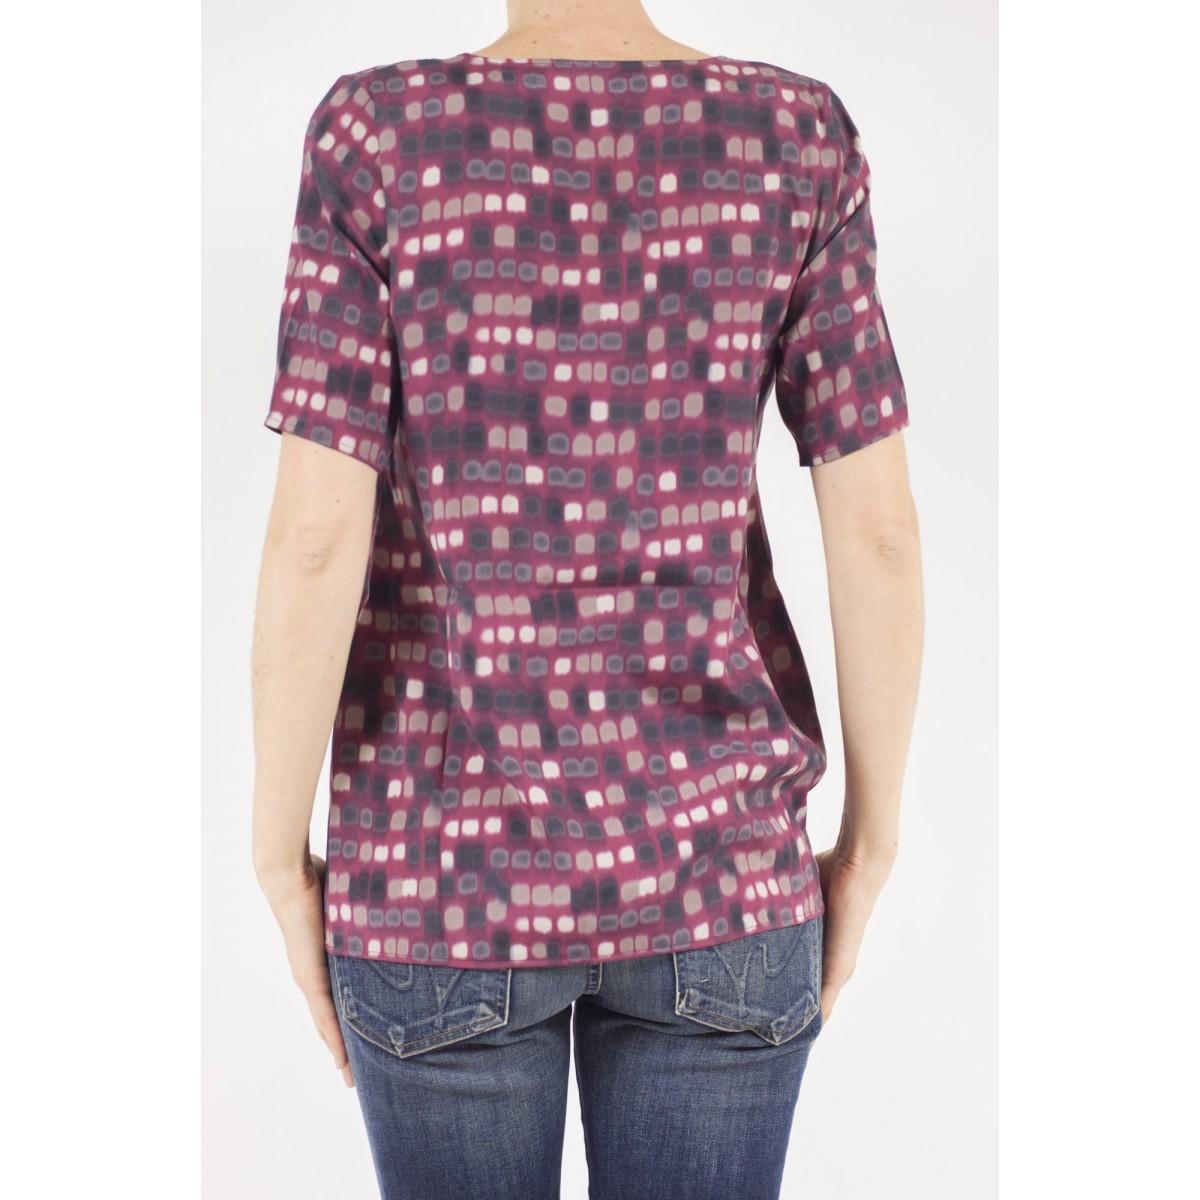 T-Shirt Woman Kangra - 7825/01 207 - Bordo